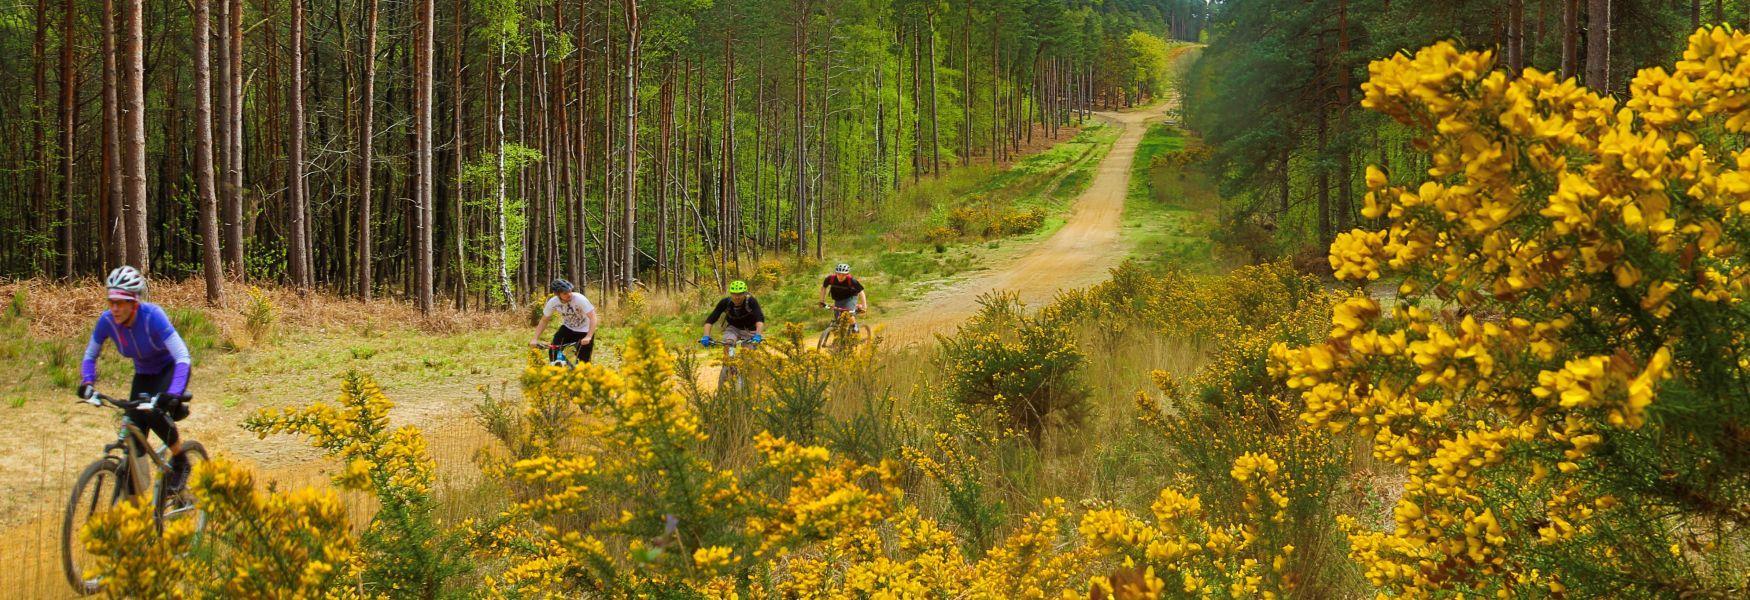 Mountain biking in the Crown Estate's Swinley Forest